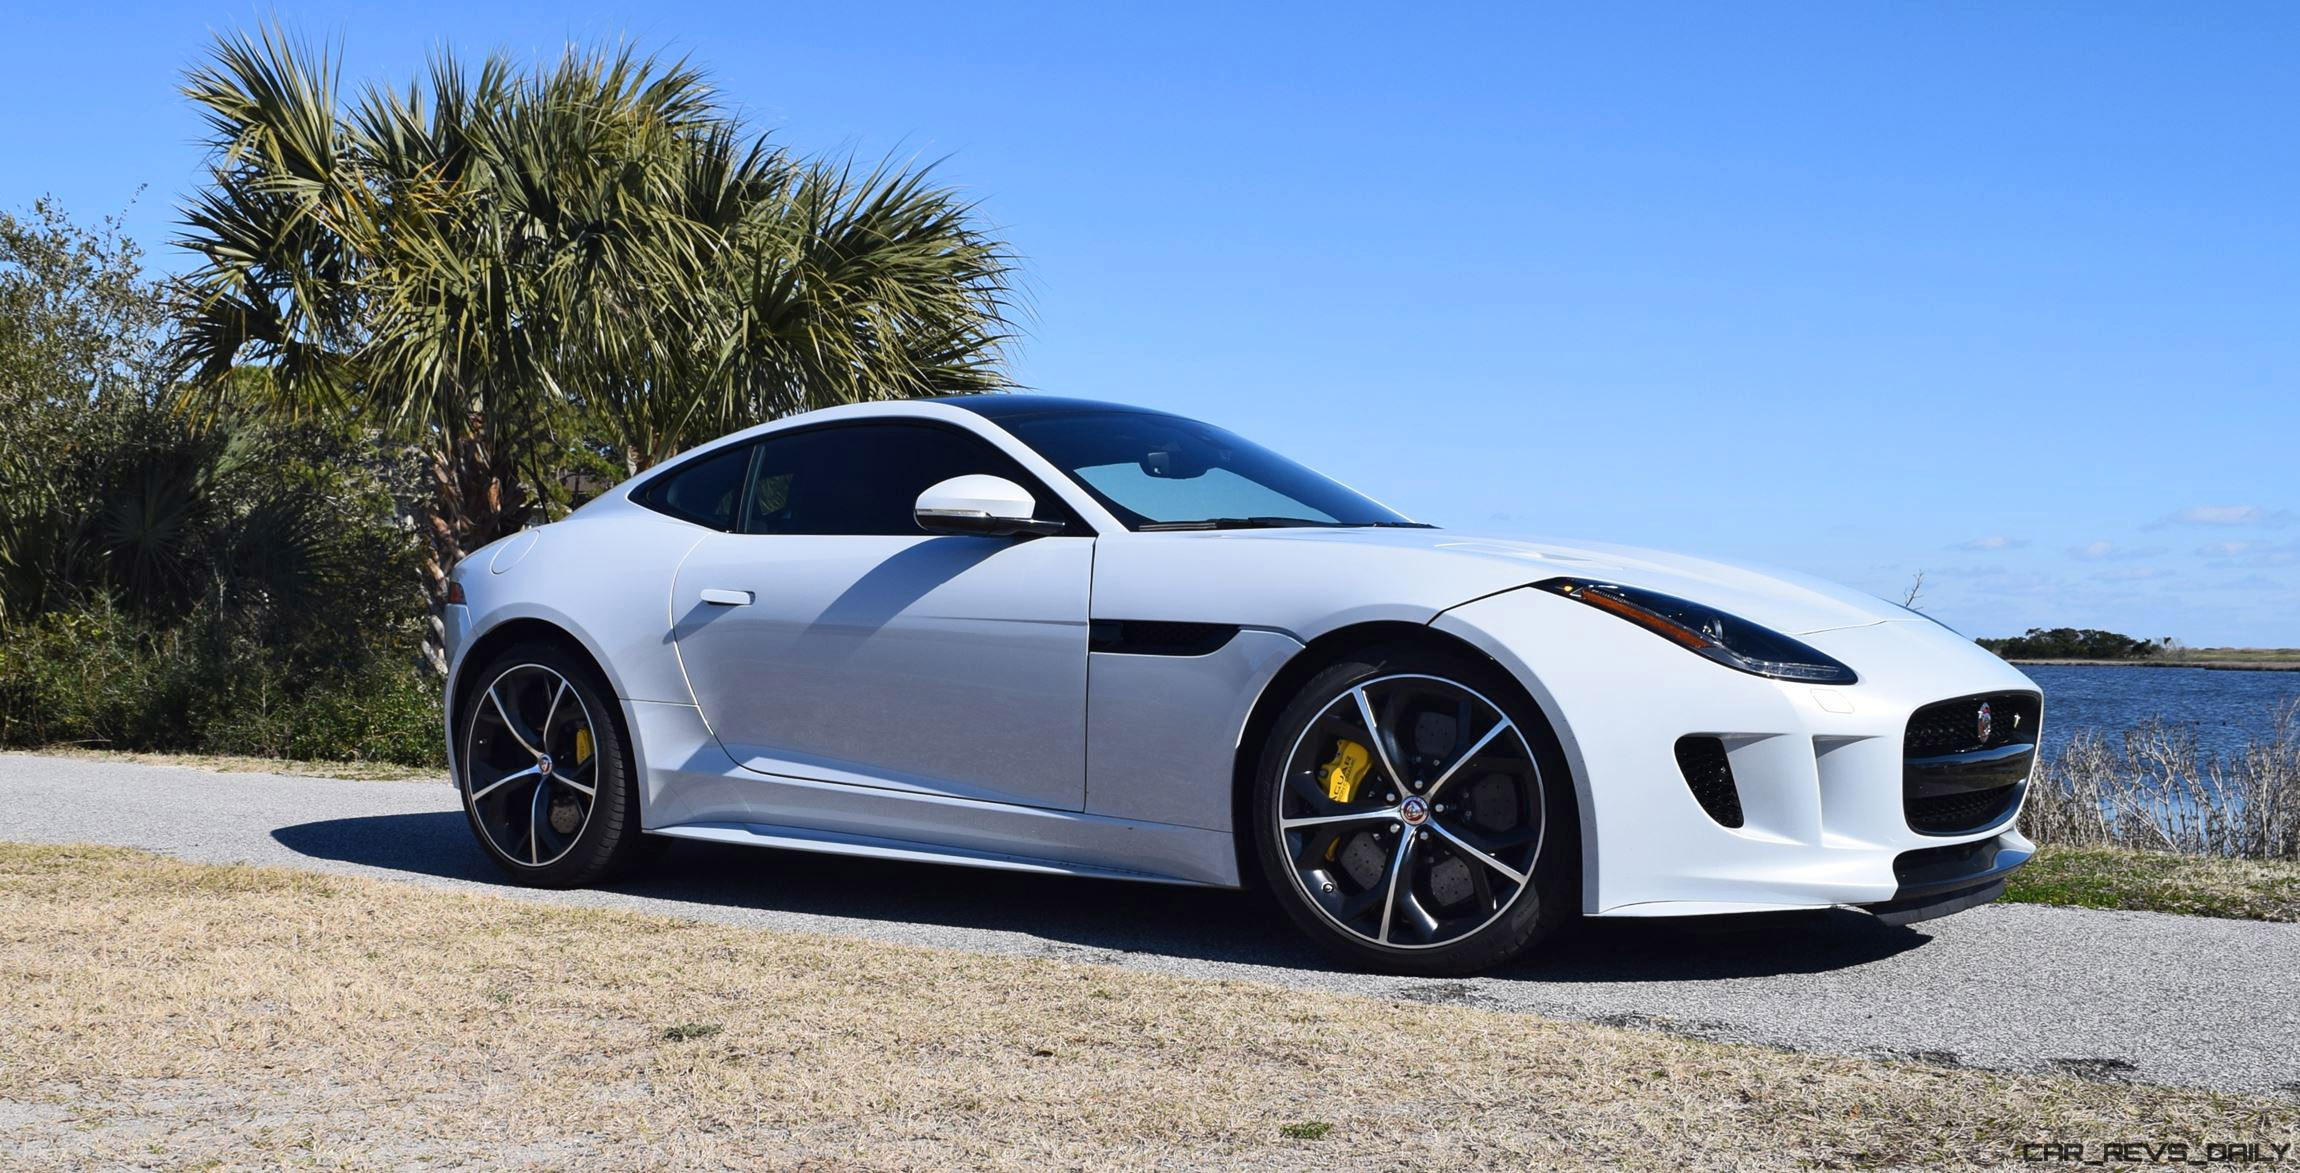 2016 jaguar f type coupe meets its rivals porsche 911 gts and aston martin v8 vantage car. Black Bedroom Furniture Sets. Home Design Ideas